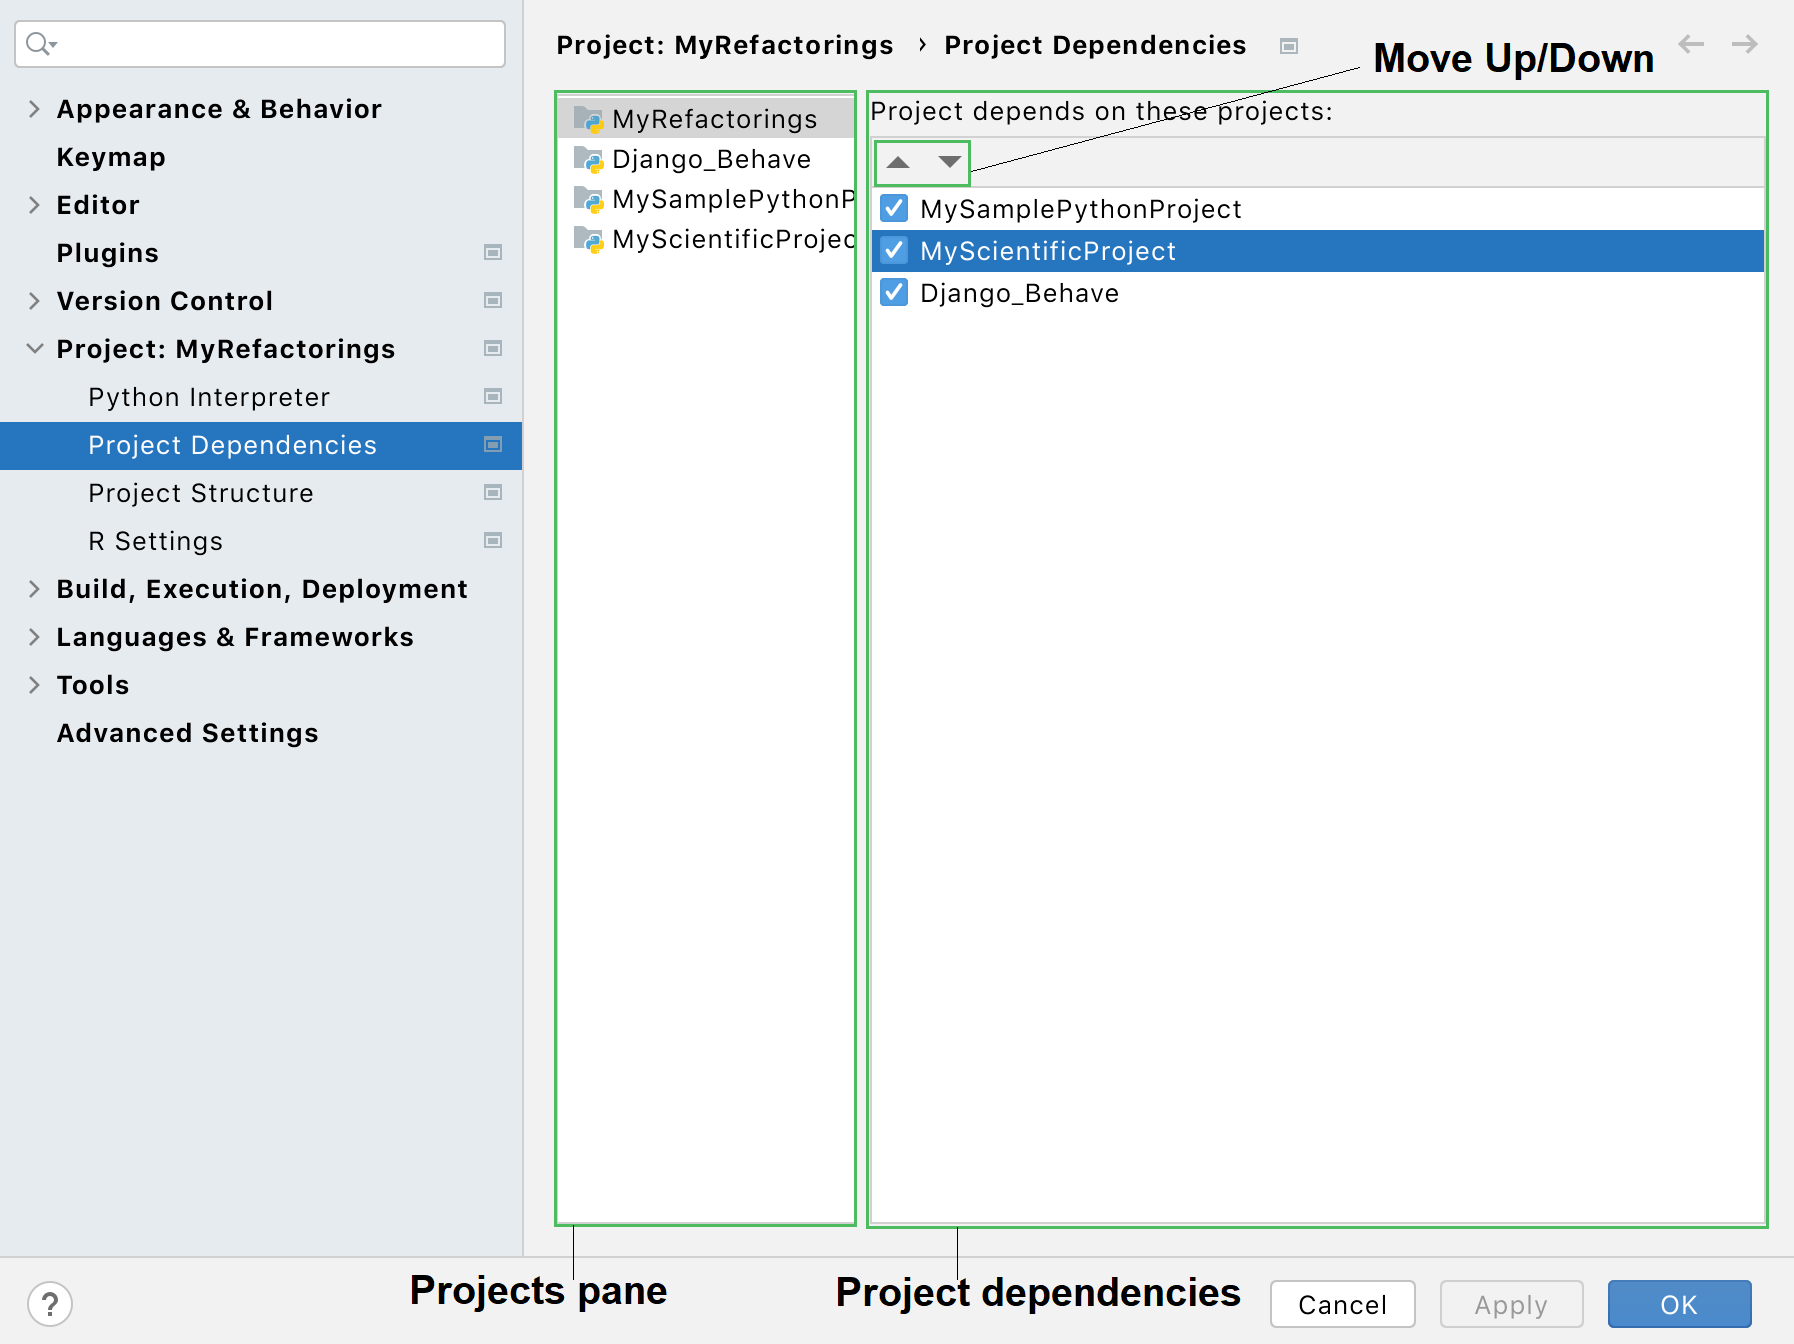 Managing project dependencies